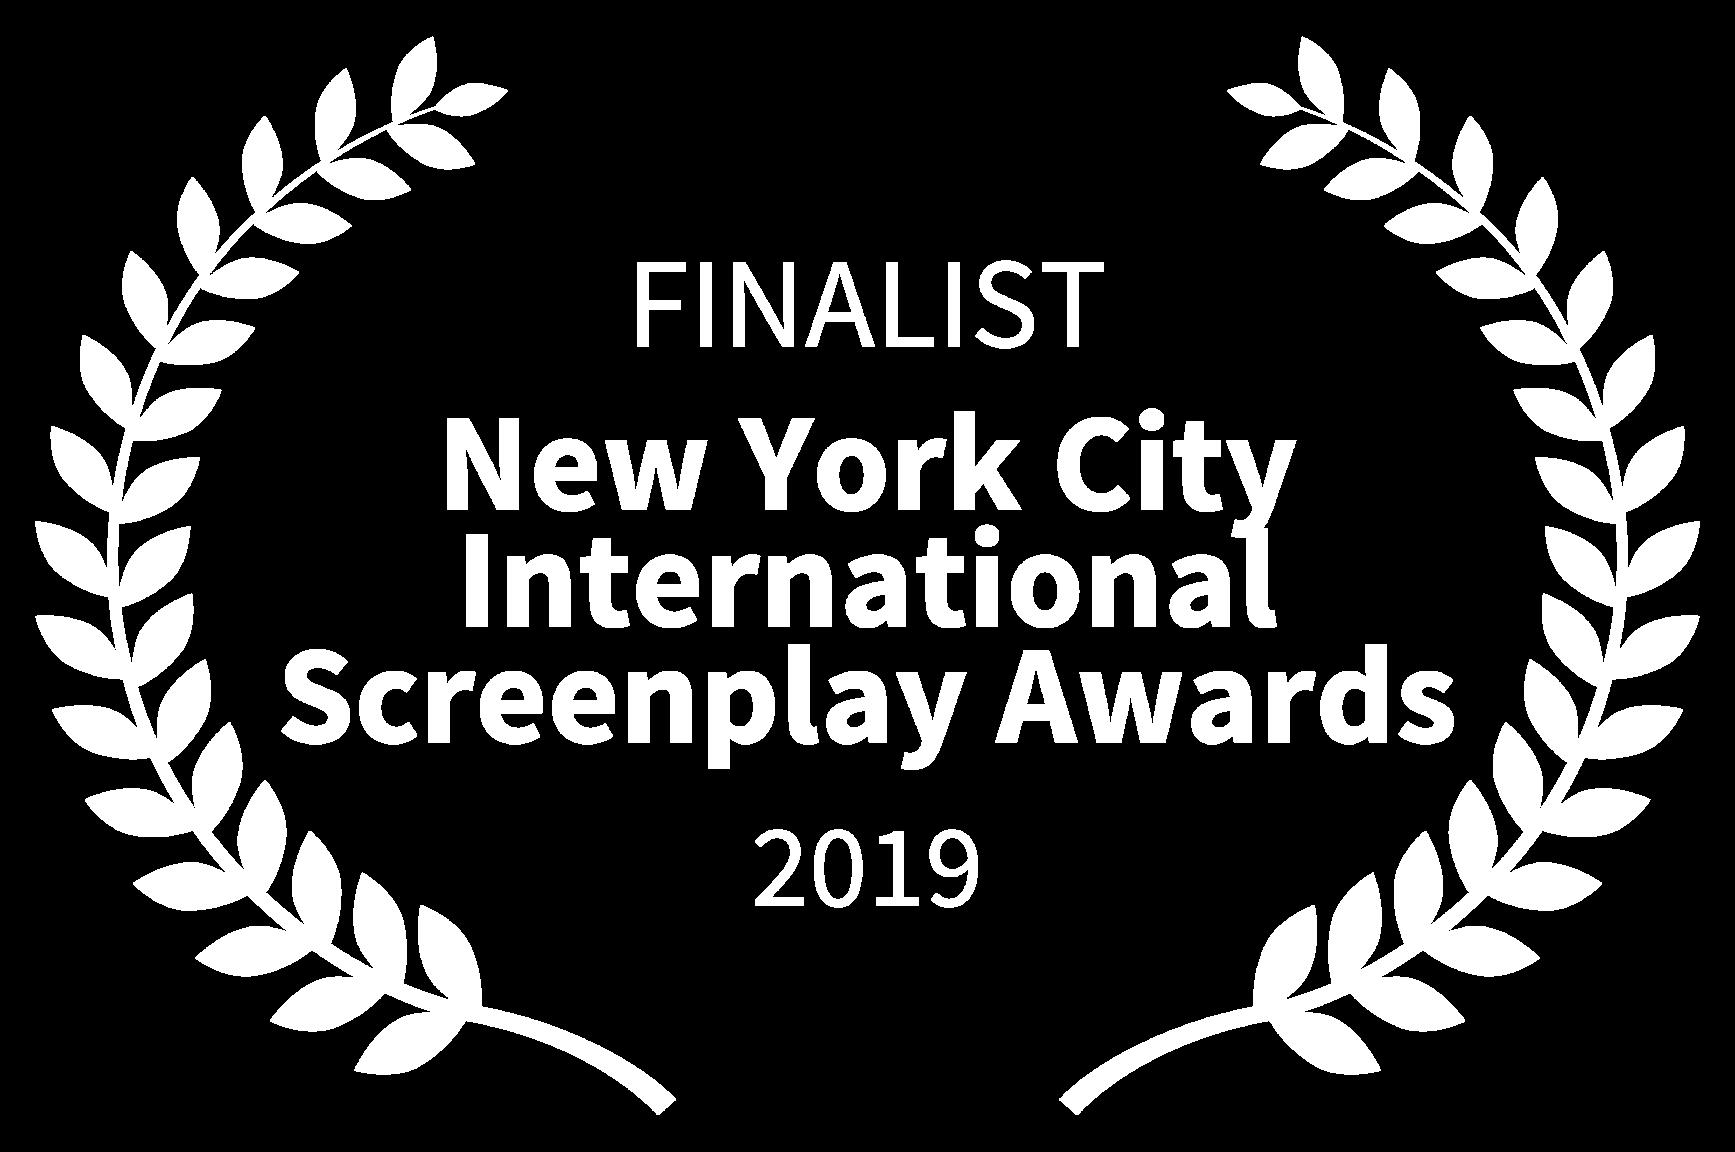 FINALIST-New-York-City-International-Screenplay-Awards-2019_Black